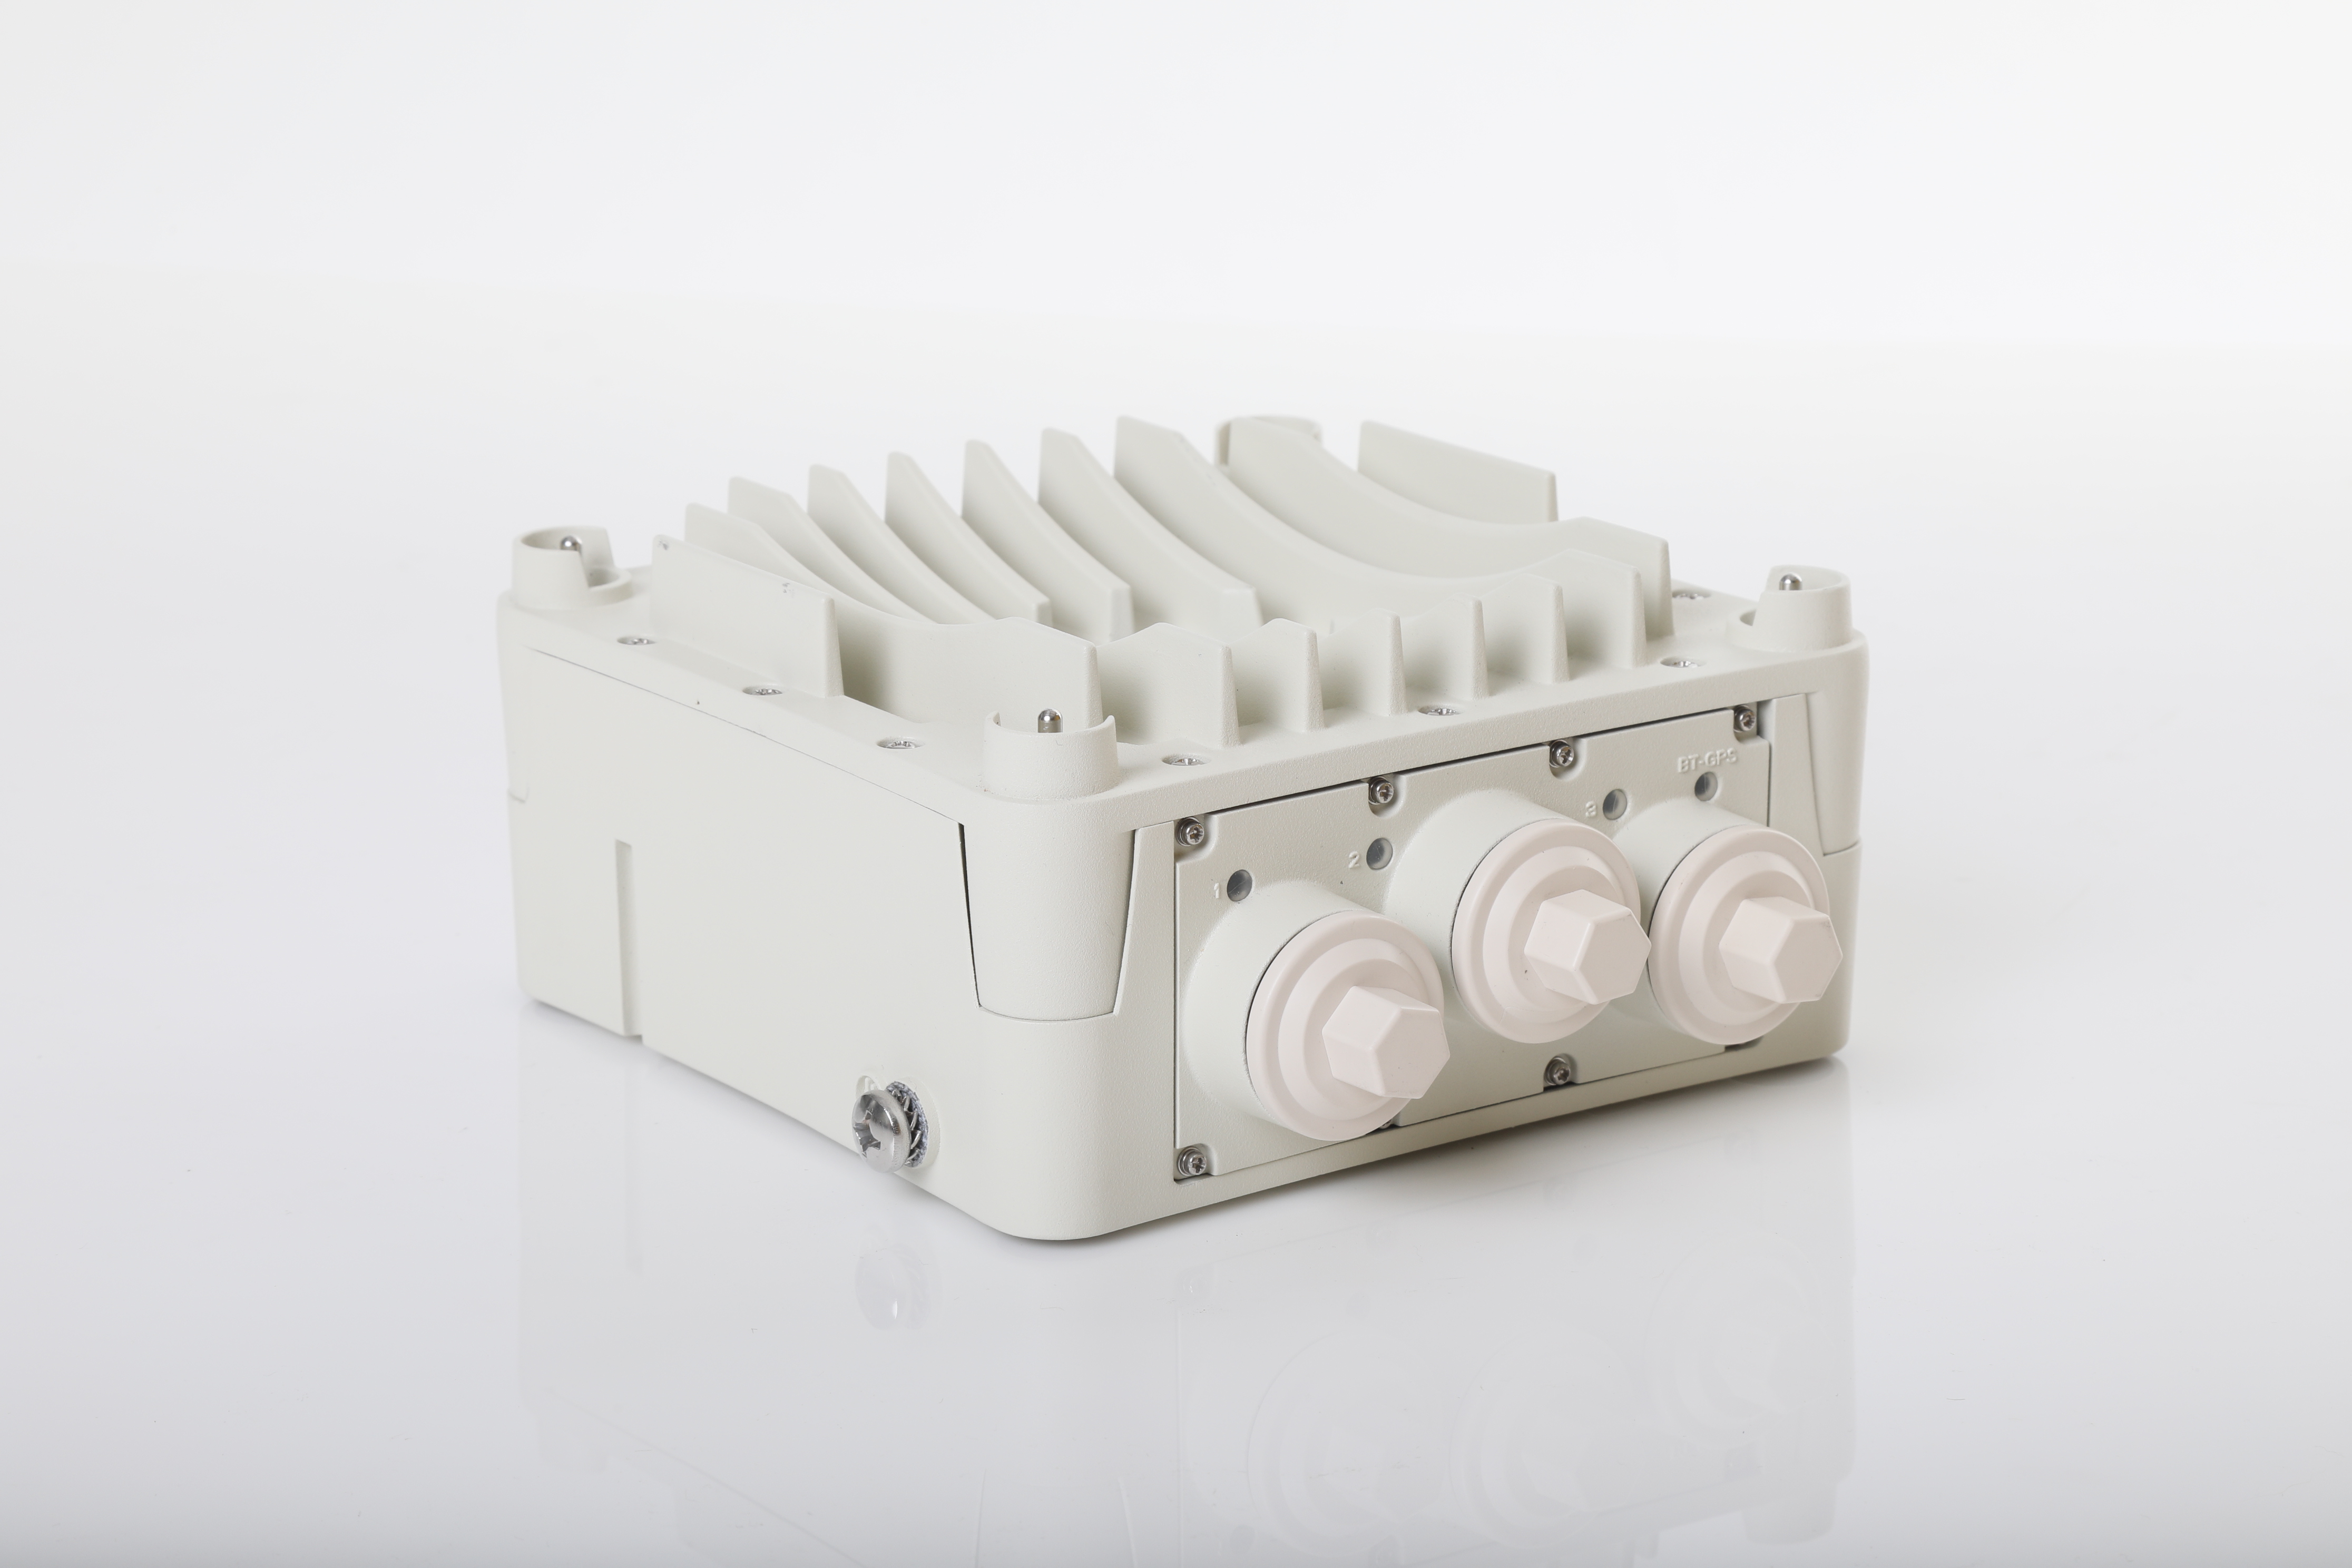 EH-710TX-ODU-EXT